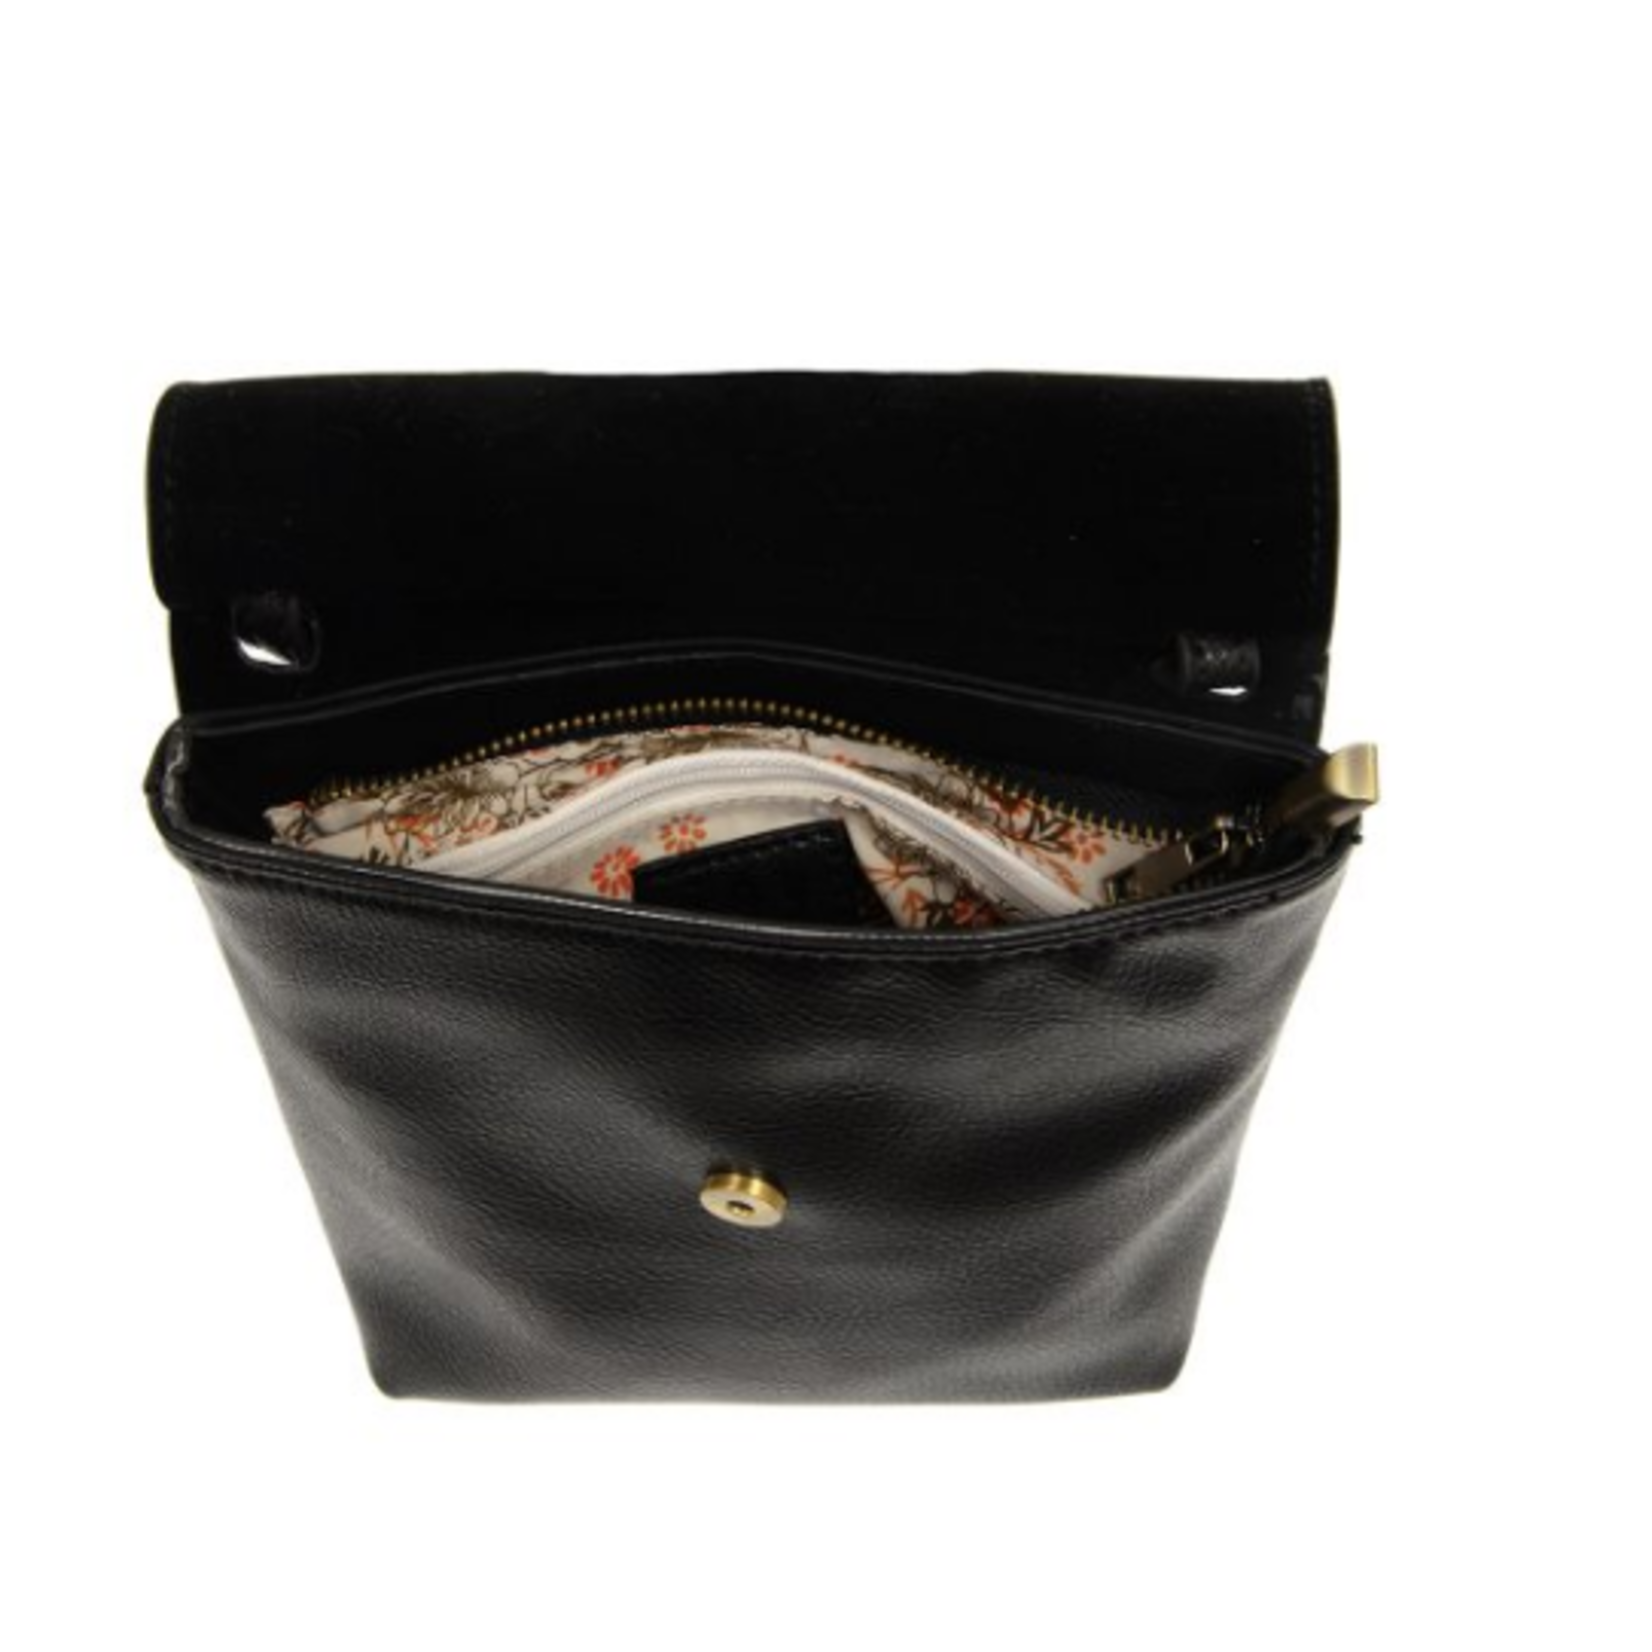 Joy Susan Joy Susan Aimee Front Flap Crossbody Bag